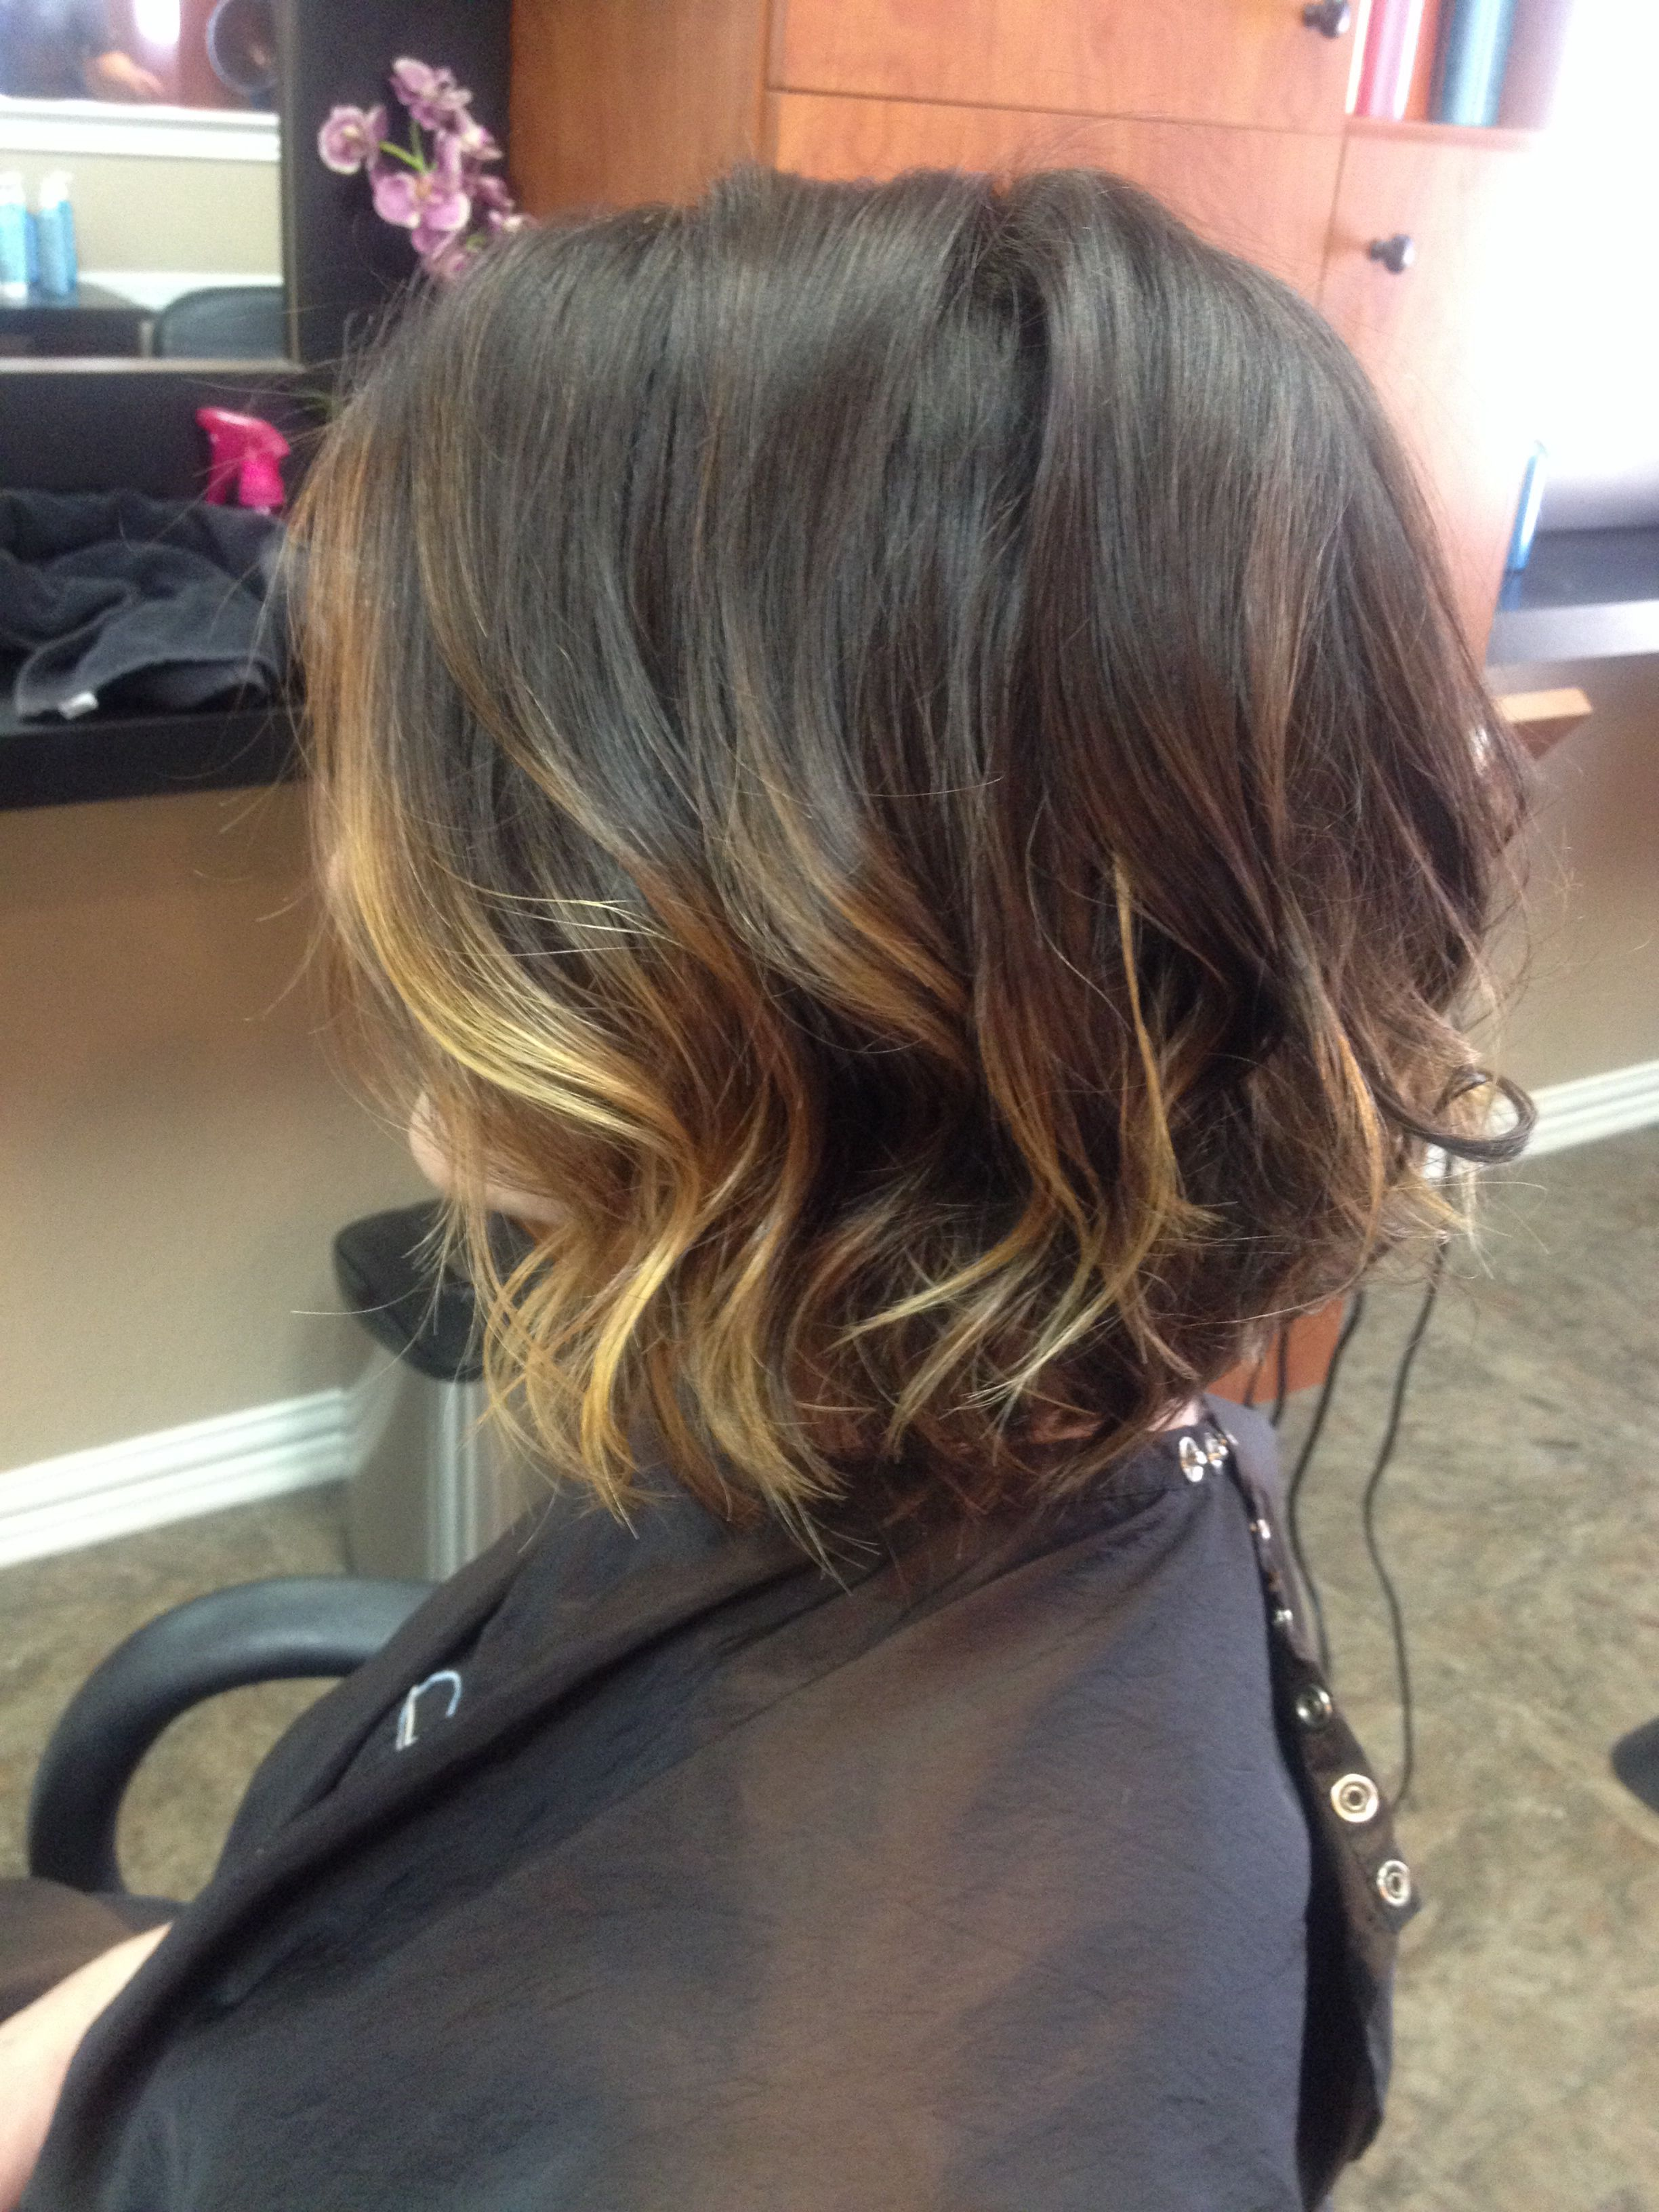 Baylayage Short Hair Bob Lob Messy Curl Beach Wave Captiva